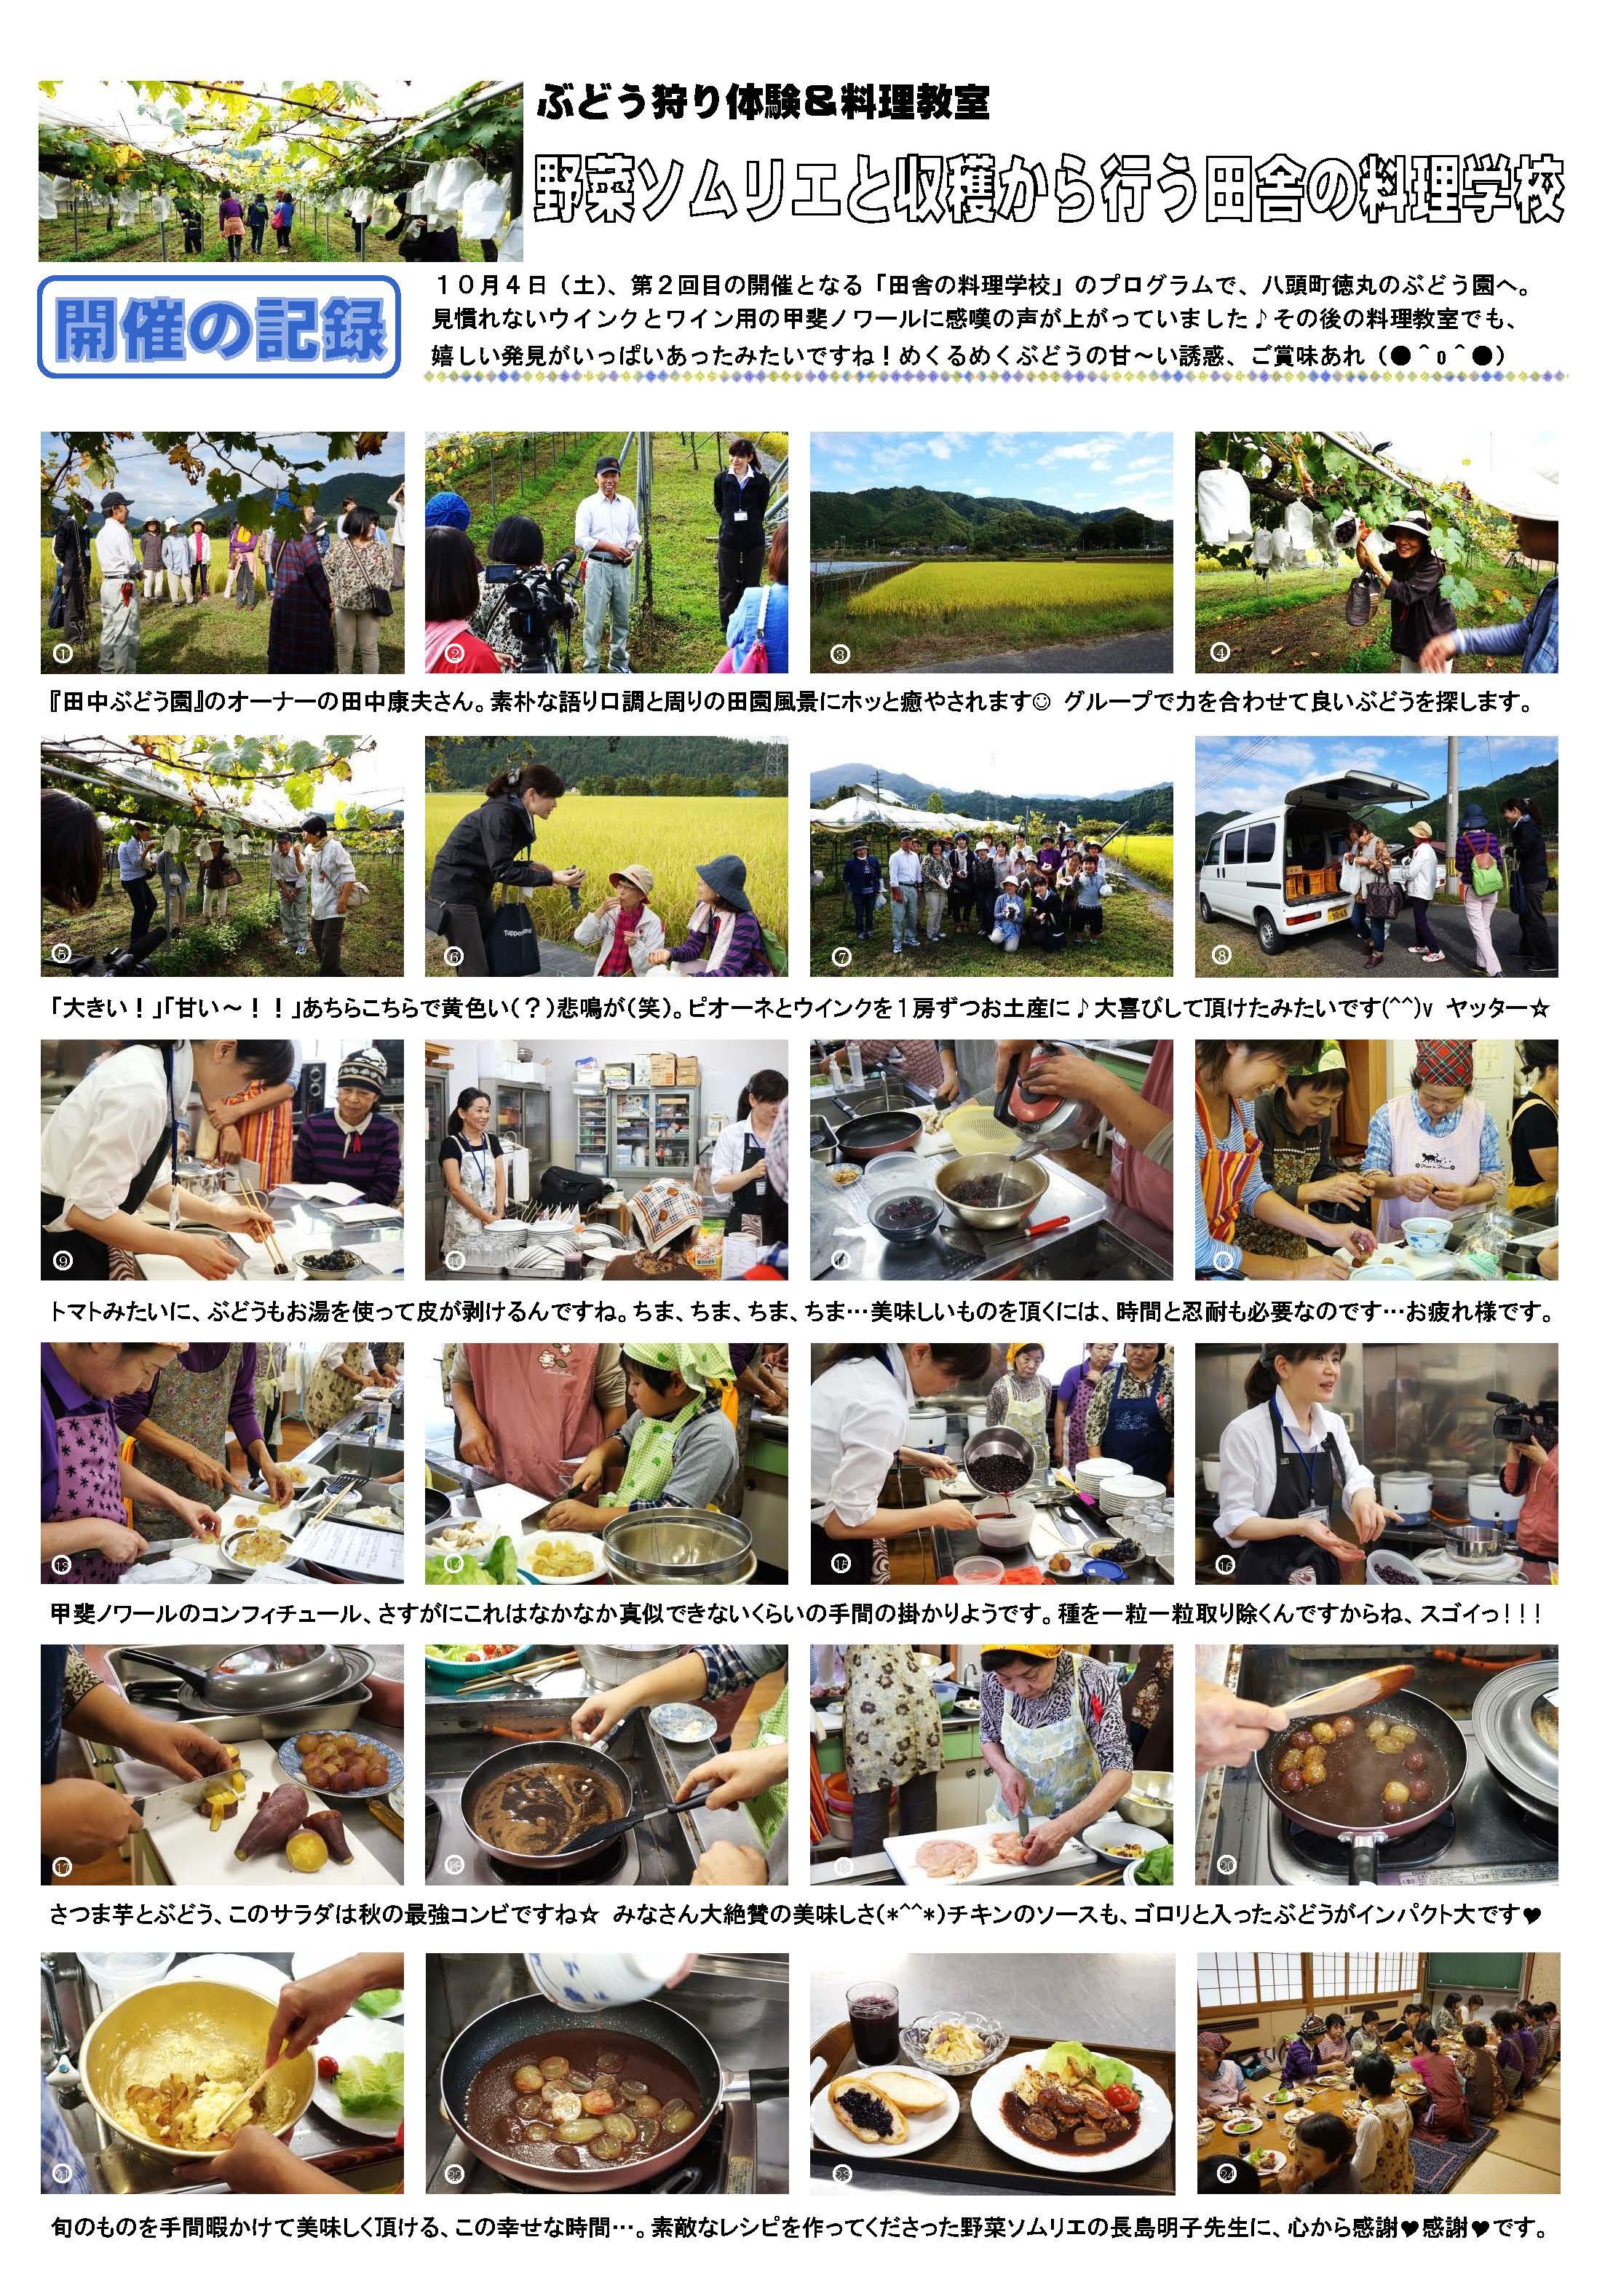 第2回田舎の料理学校開催記録